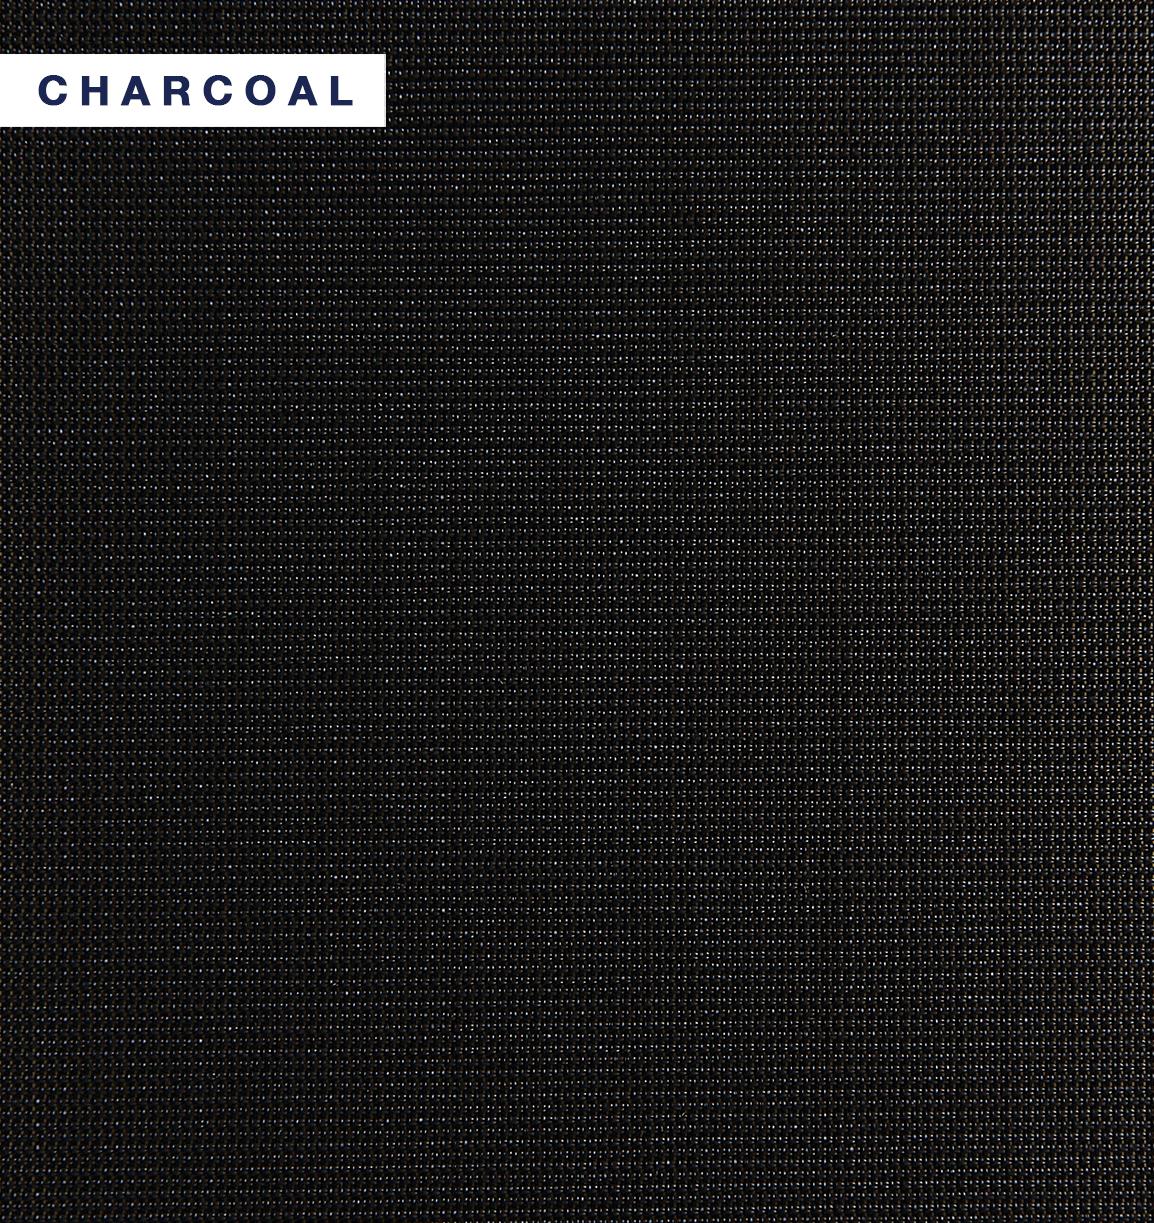 SW4300 - Charcoal.jpg